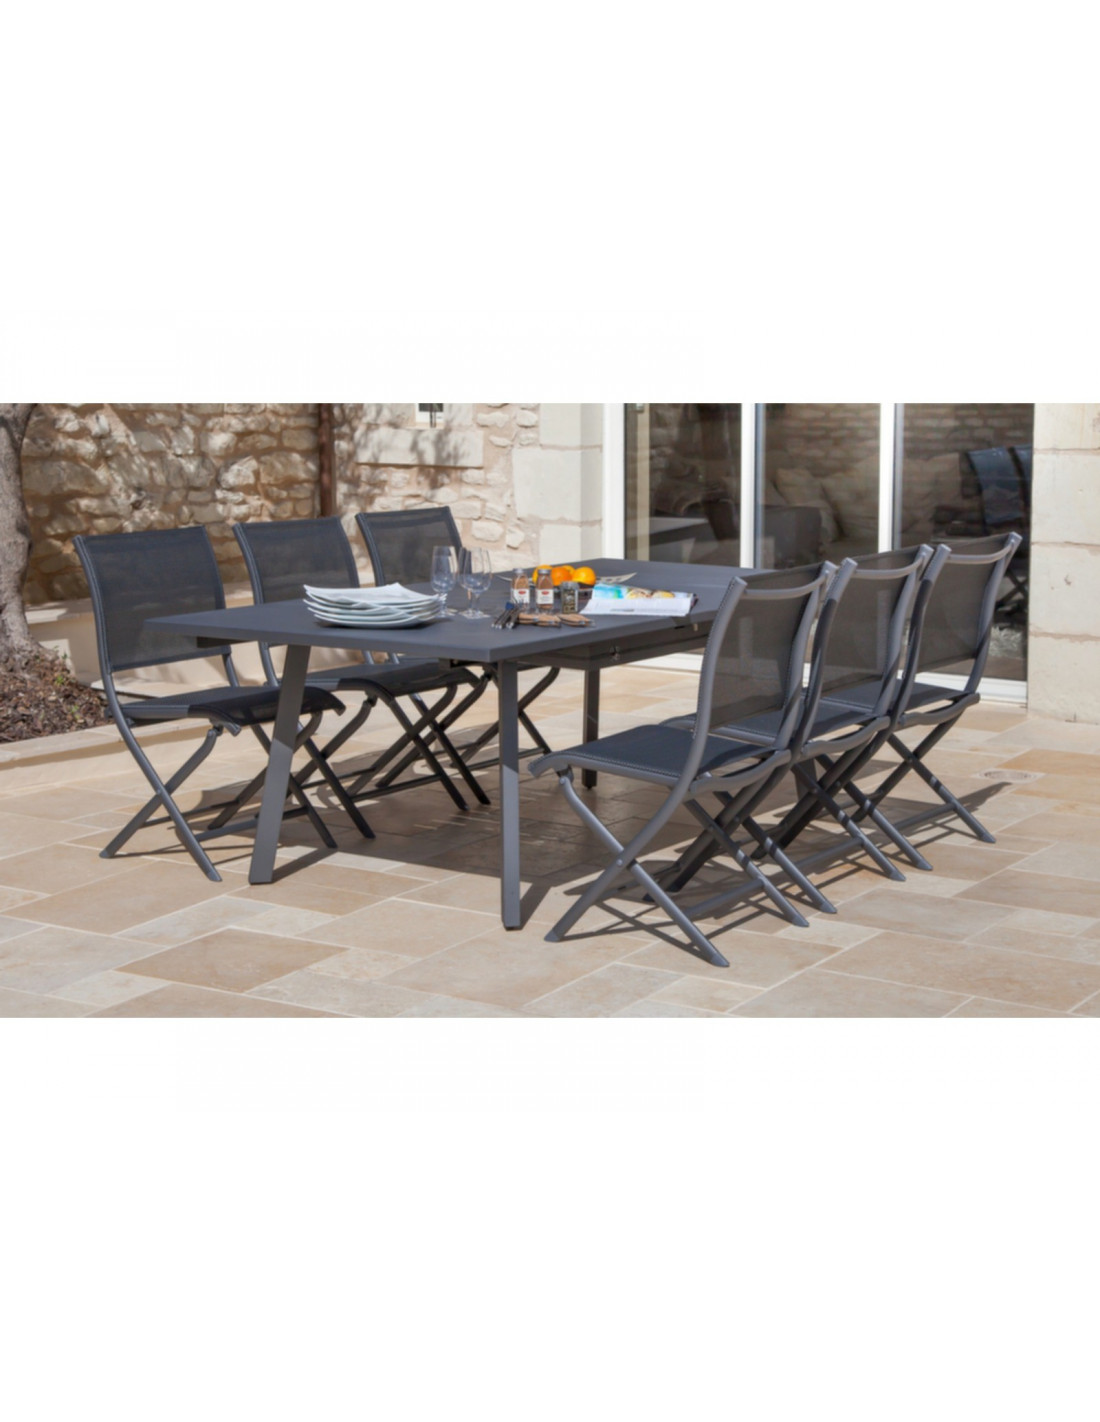 Chaise de jardin Elegance en aluminium grey et textilène - Océo